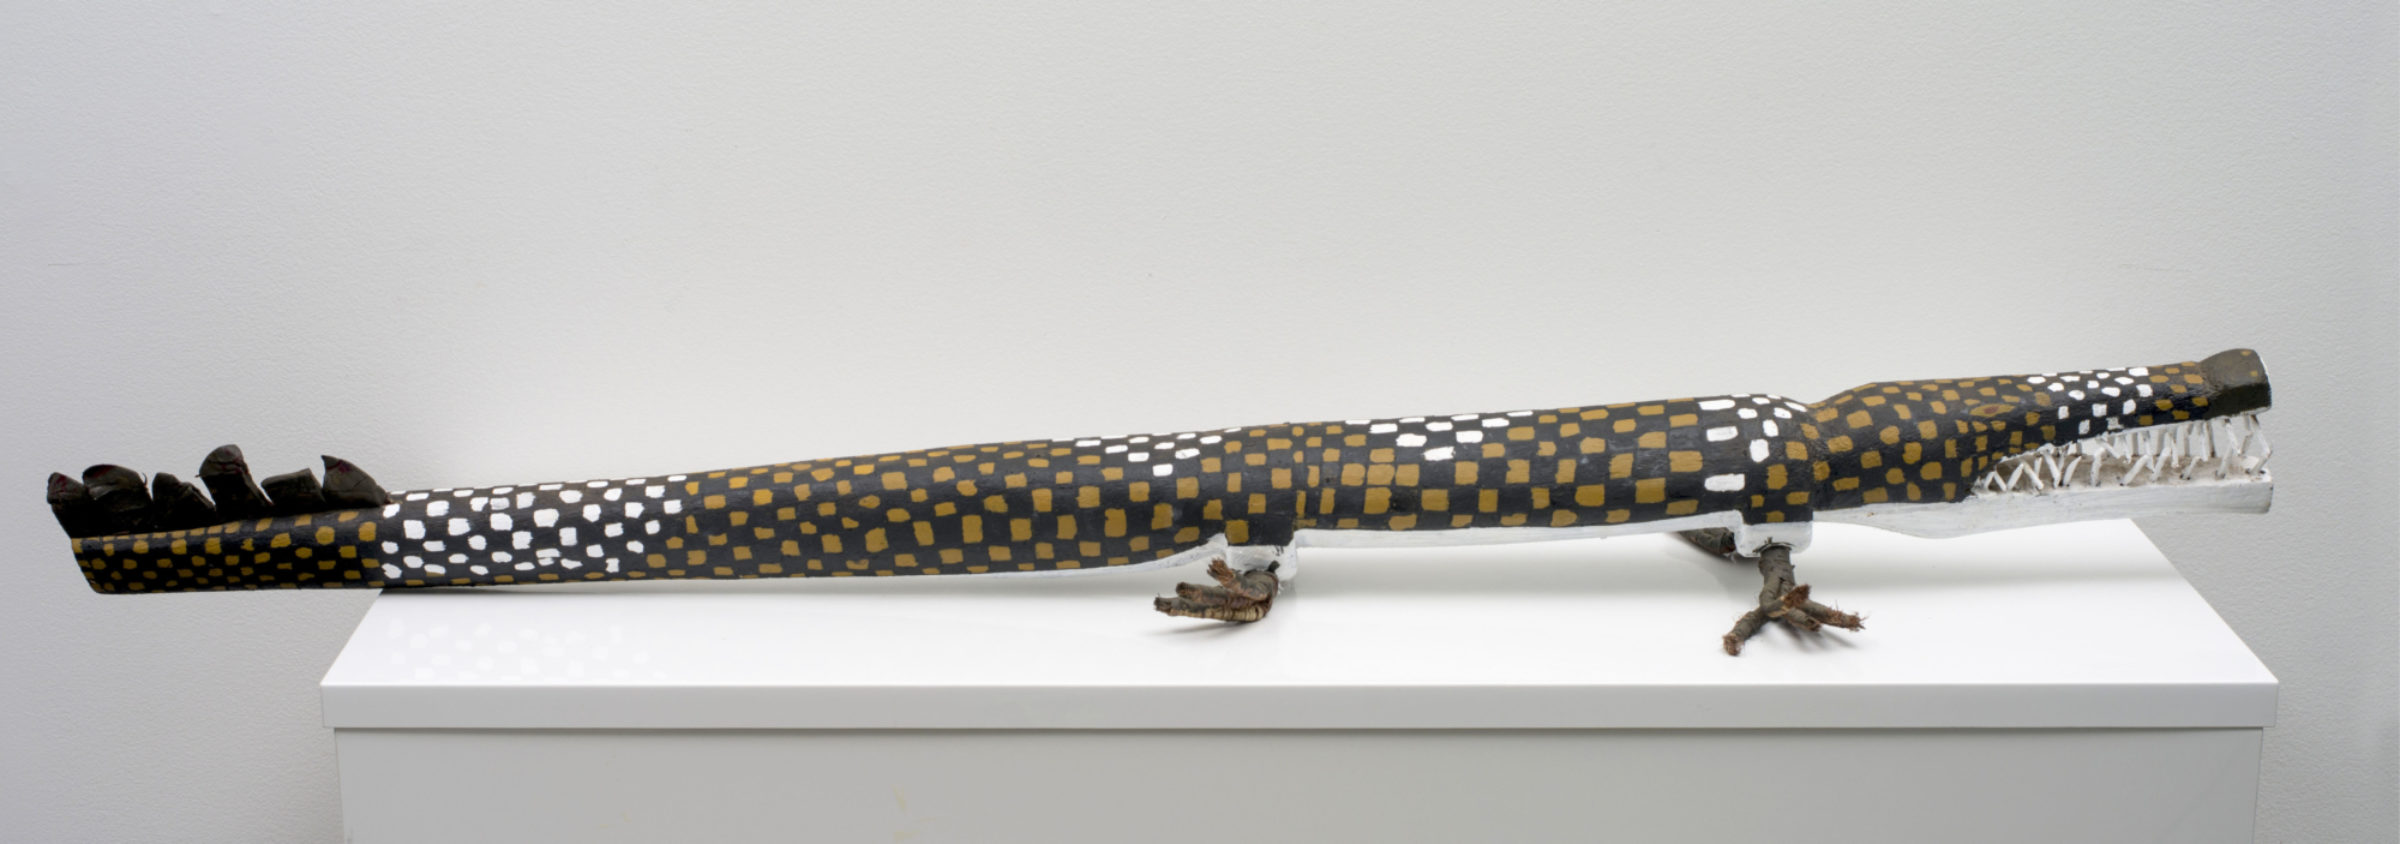 LENA-YARINKURA_'Kinga-Crocodile__2017_149-x-25-cm_top